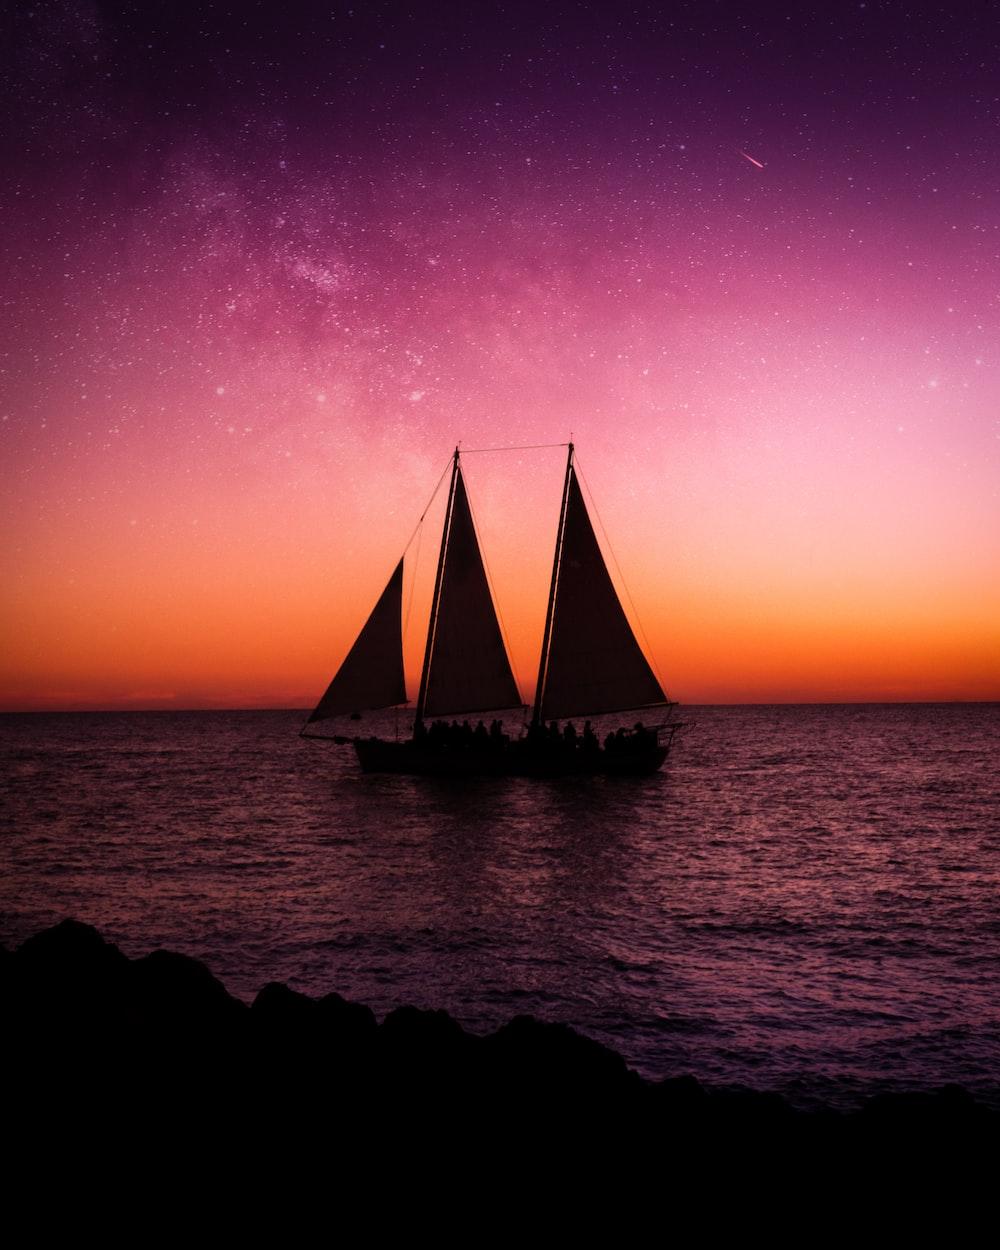 sail ship on sea